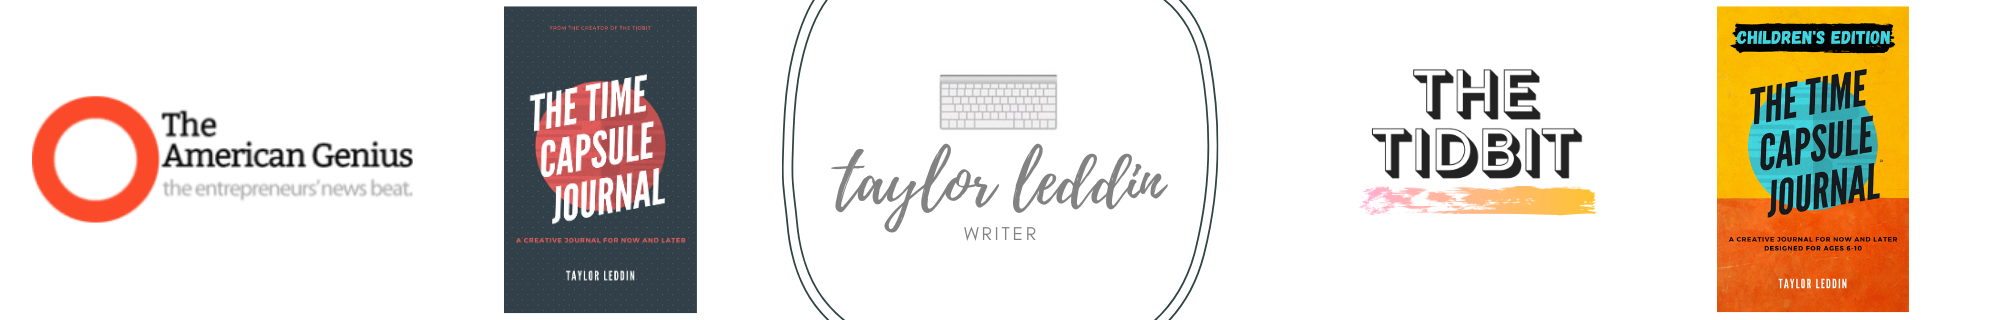 Taylor Leddin